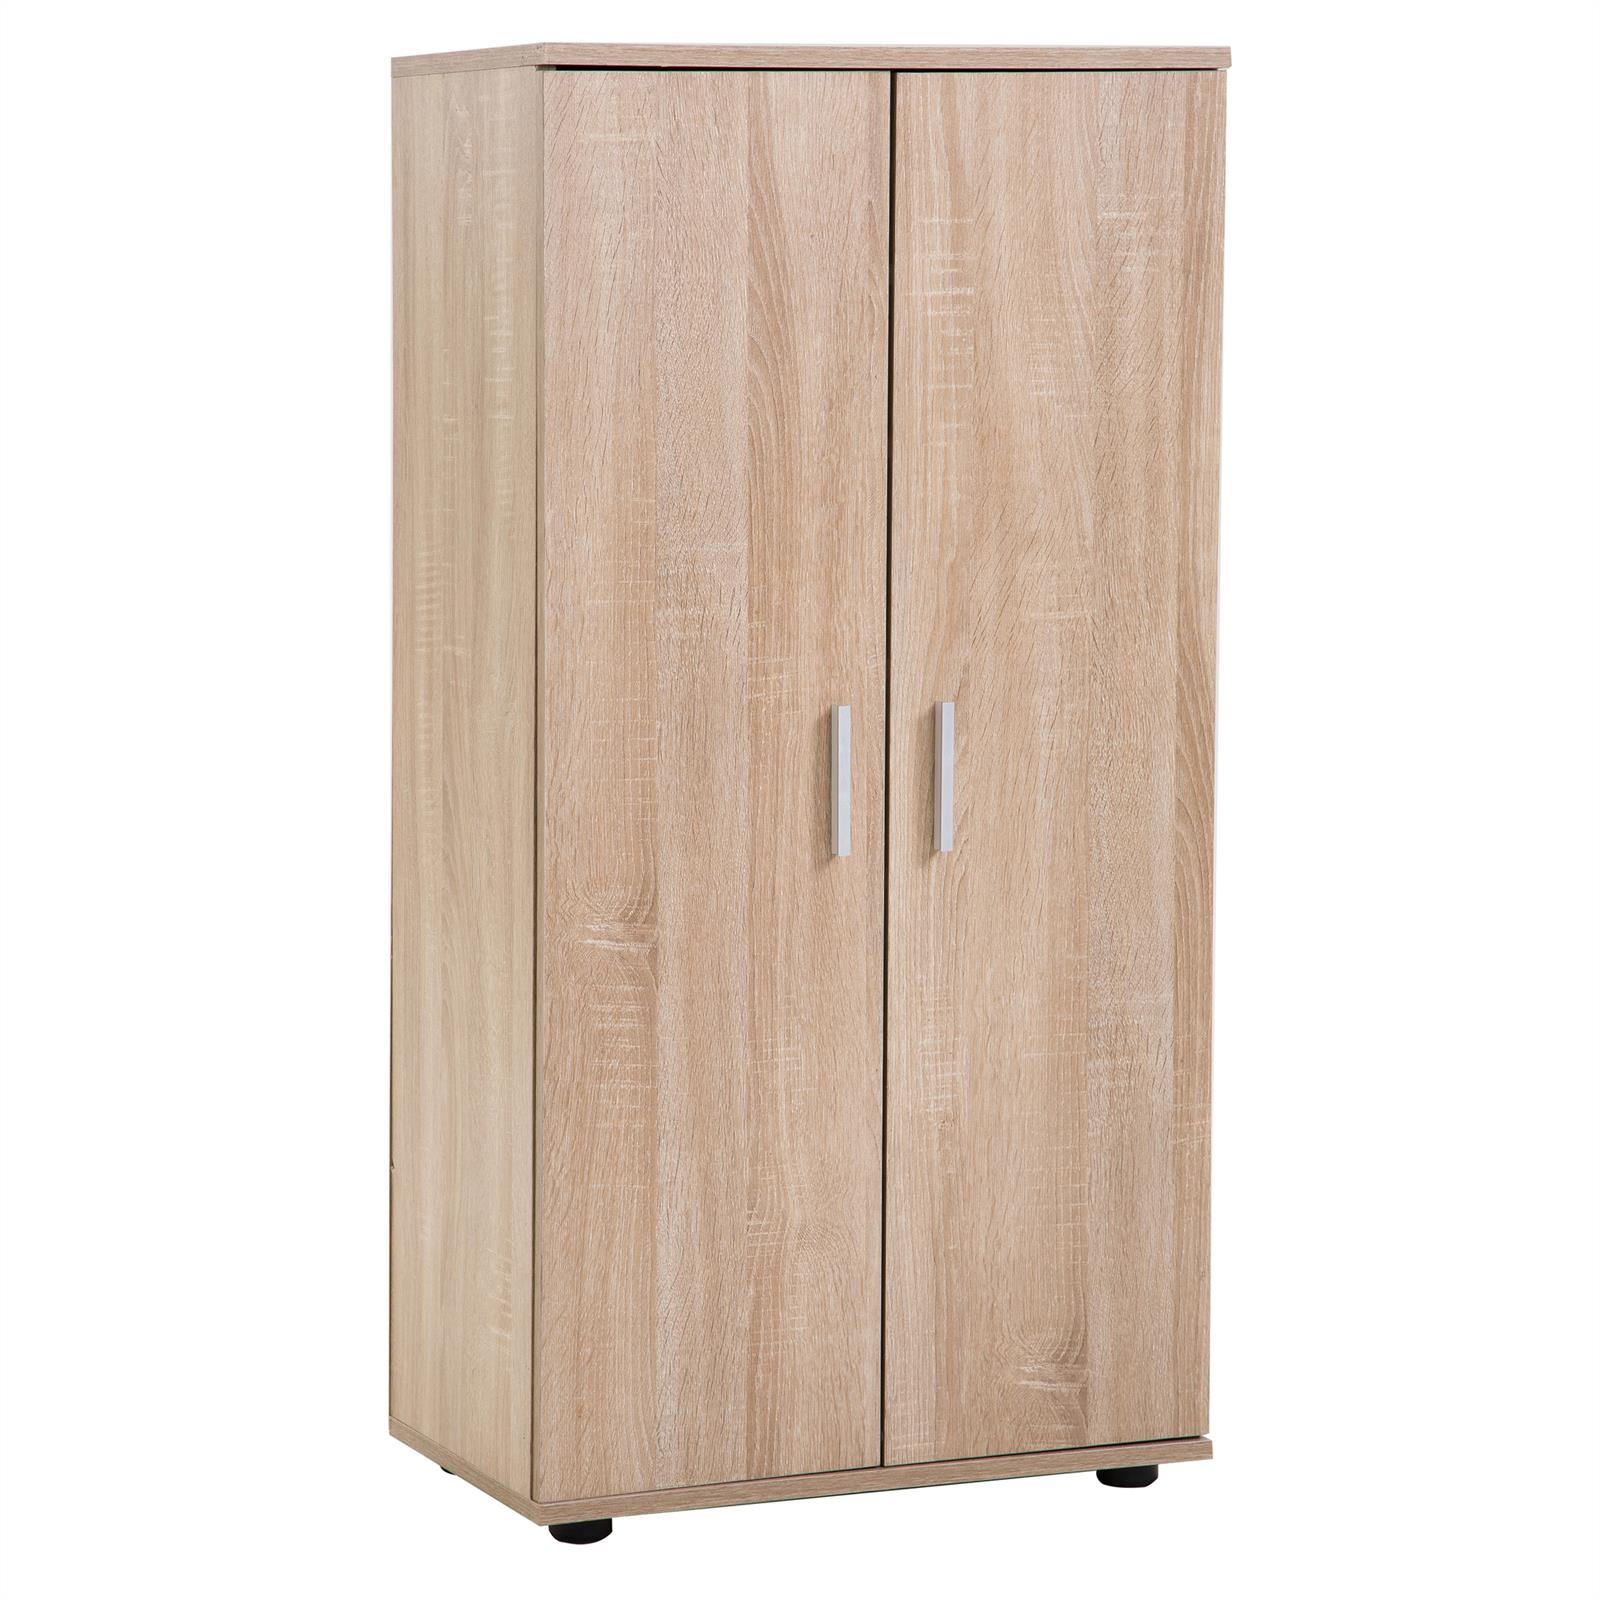 schuhschrank schuhregal kommode aufbewahrung diele flur. Black Bedroom Furniture Sets. Home Design Ideas